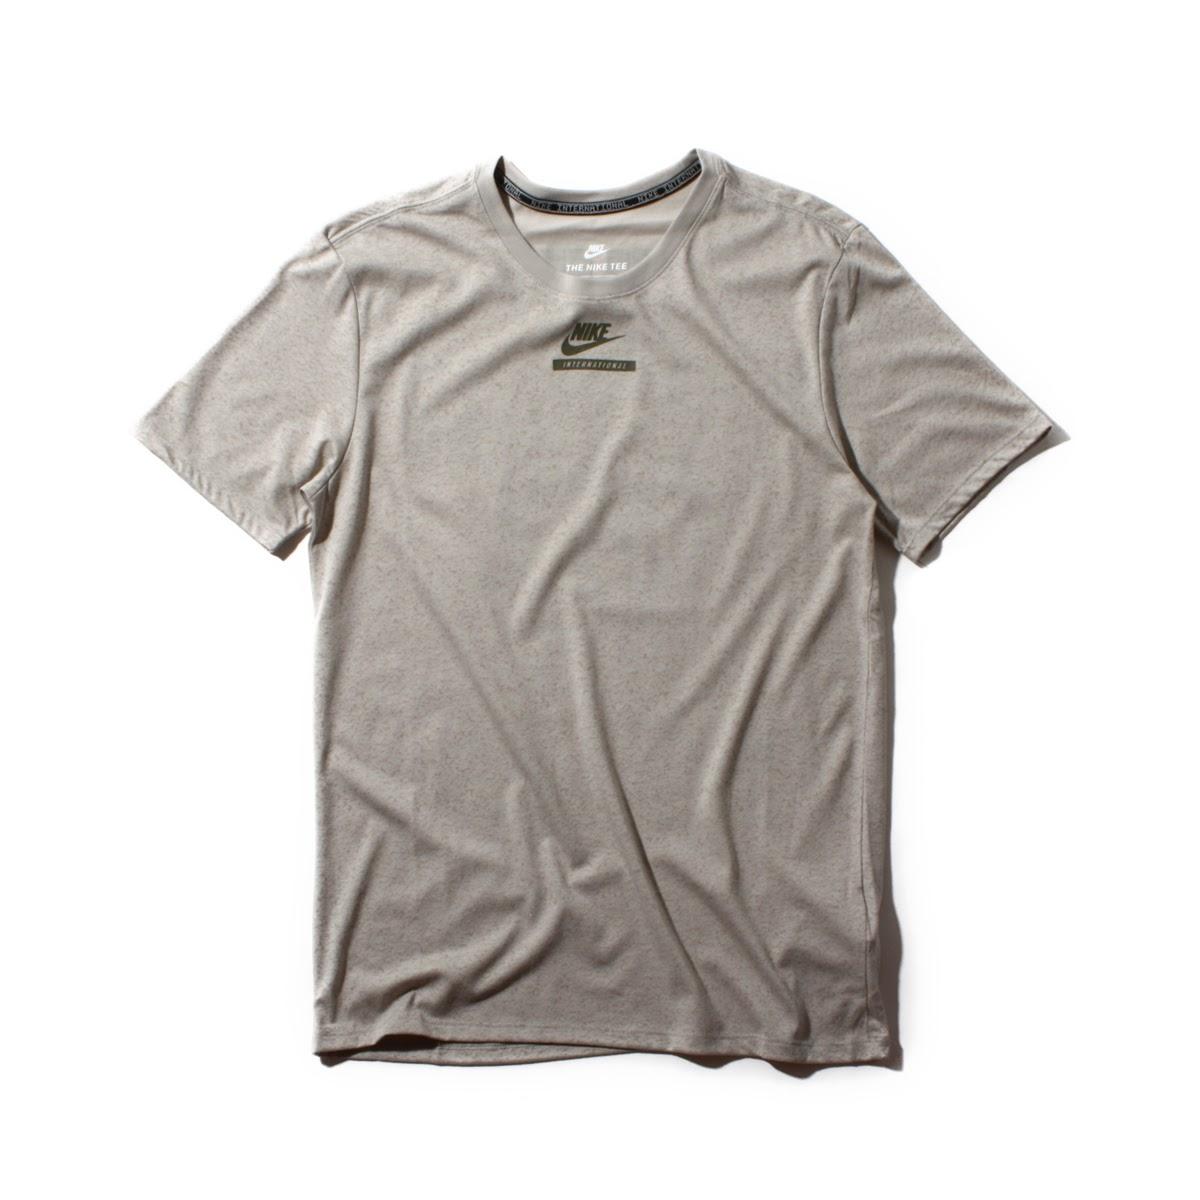 NIKE AS M NK INTL TEE VERB (Nike international VERB T-shirt) PALE  GREY COBBLESTONE (MEDIUM OLIVE) 17FA-I 5102973b4d45